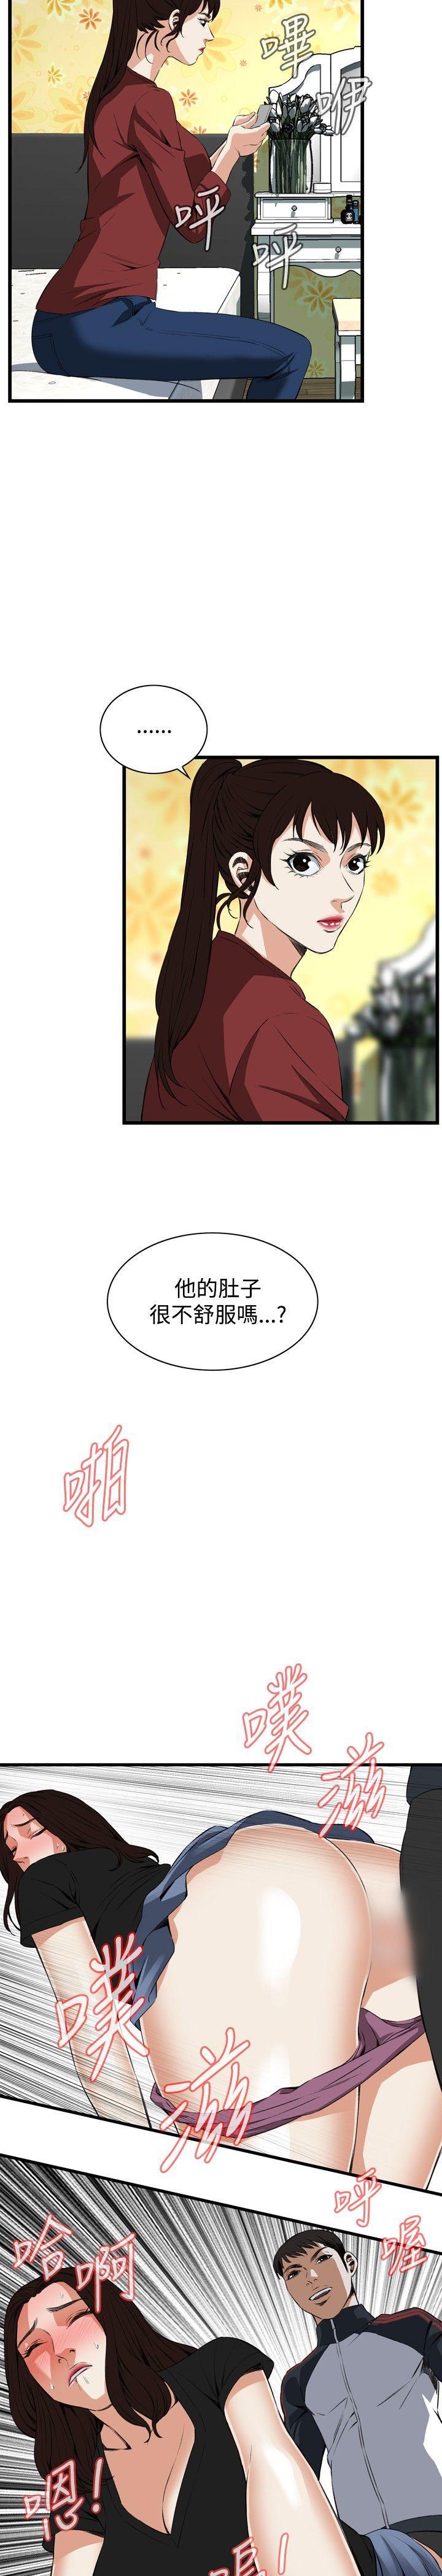 Take a Peek 偷窥 Ch.39~60 [Chinese]中文 581